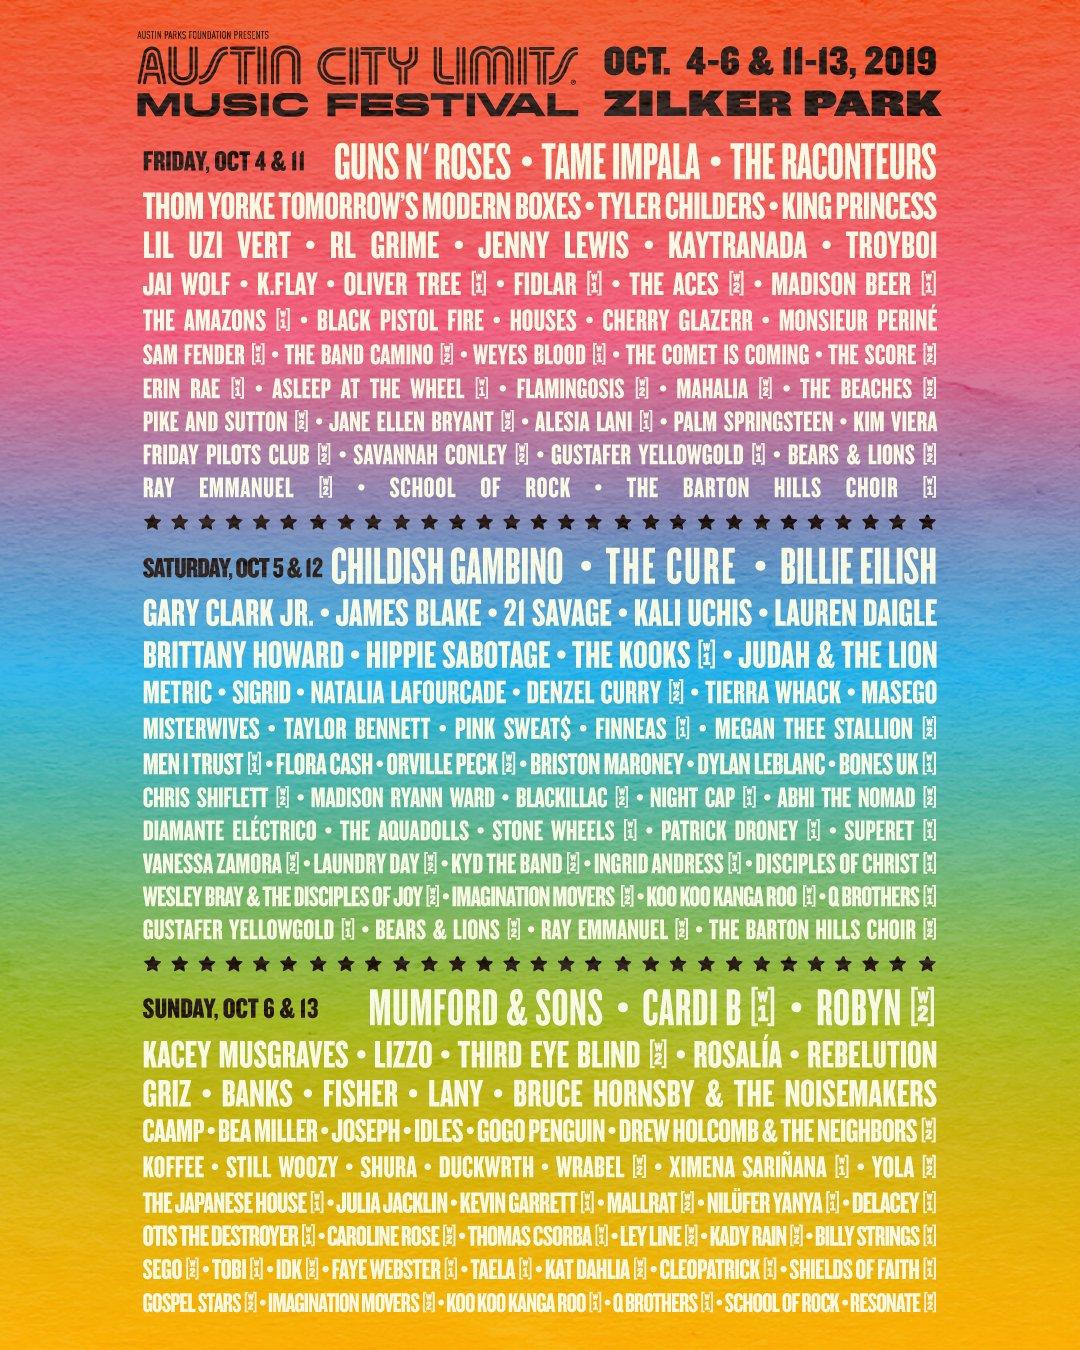 Austin City Limits 2019  Lineup